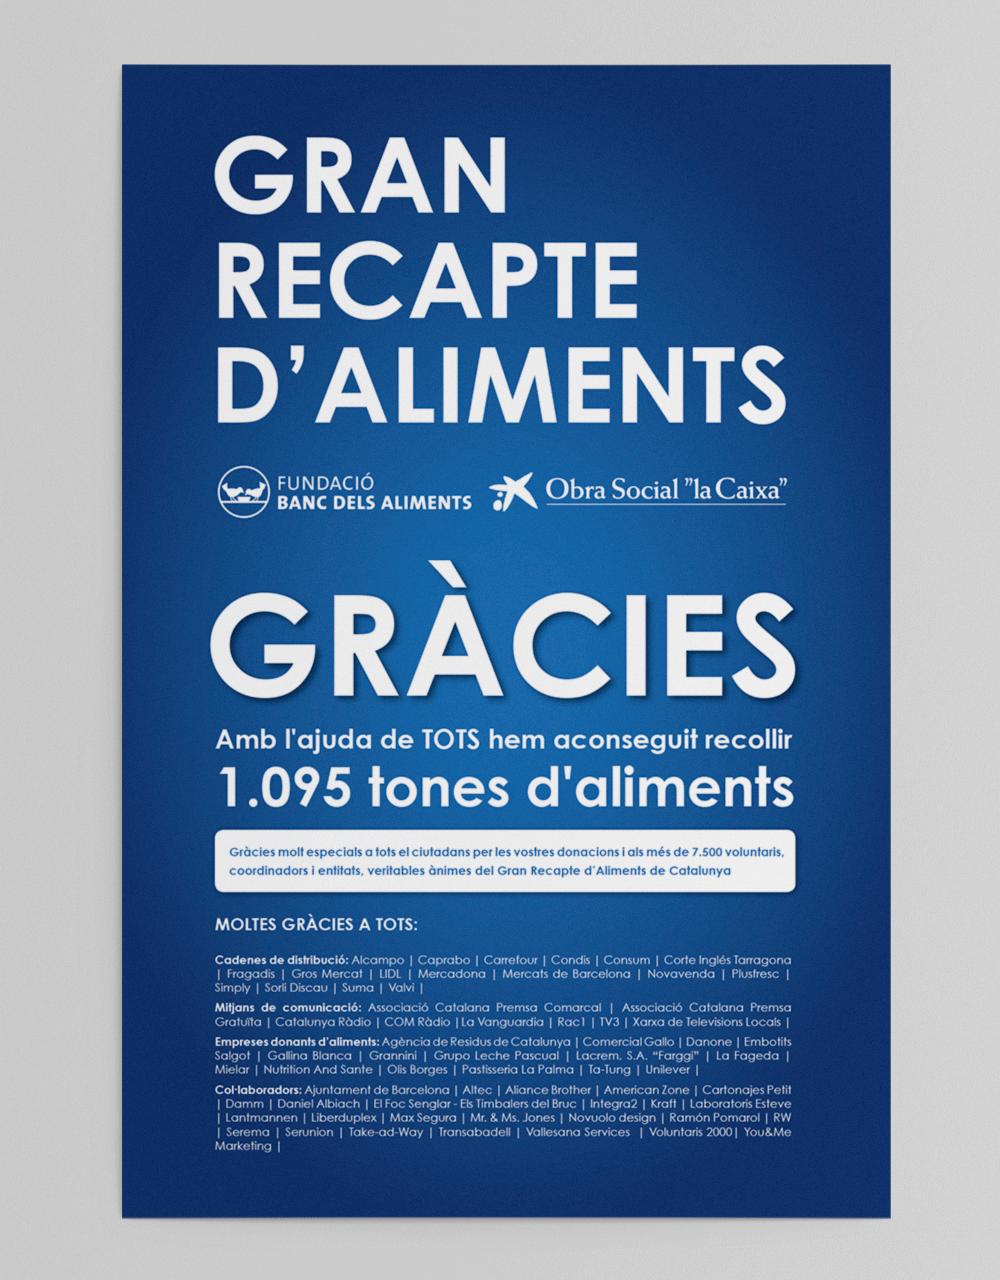 Campaña_GranRecapte_BancAliments_2012_Gracies